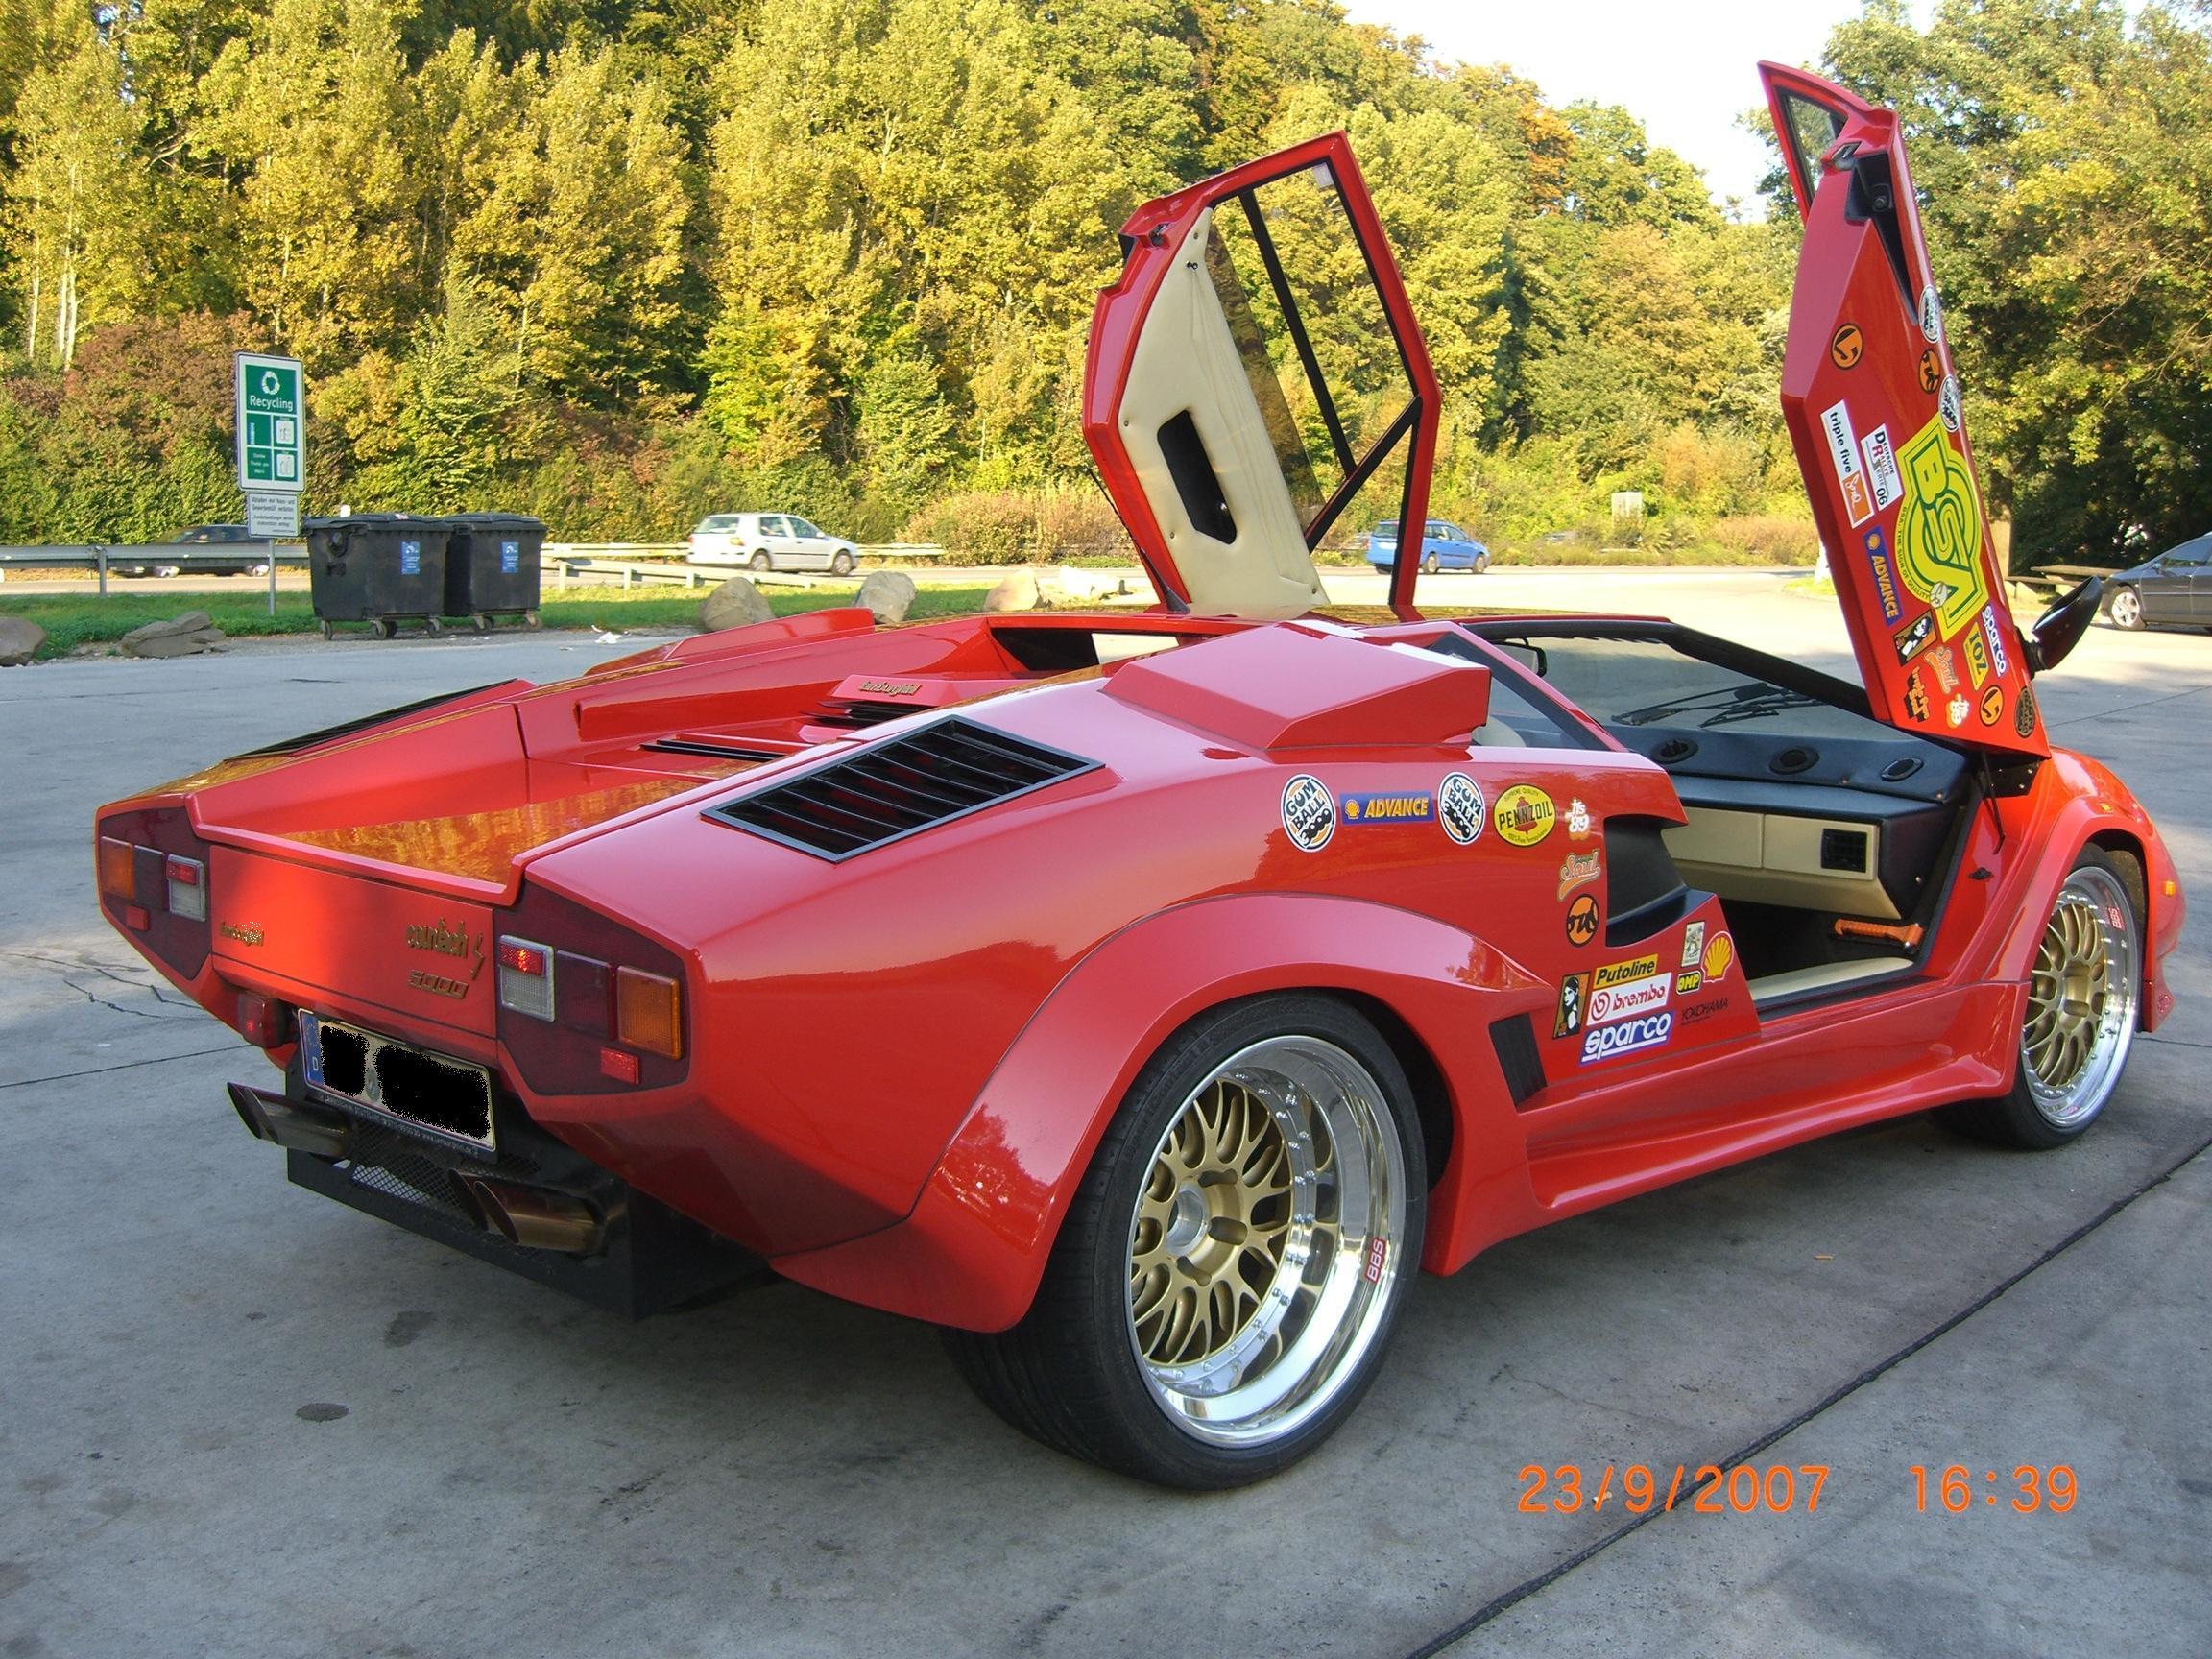 Strohm%20Heck Wonderful Lamborghini Countach Strohm De Rella Cars Trend